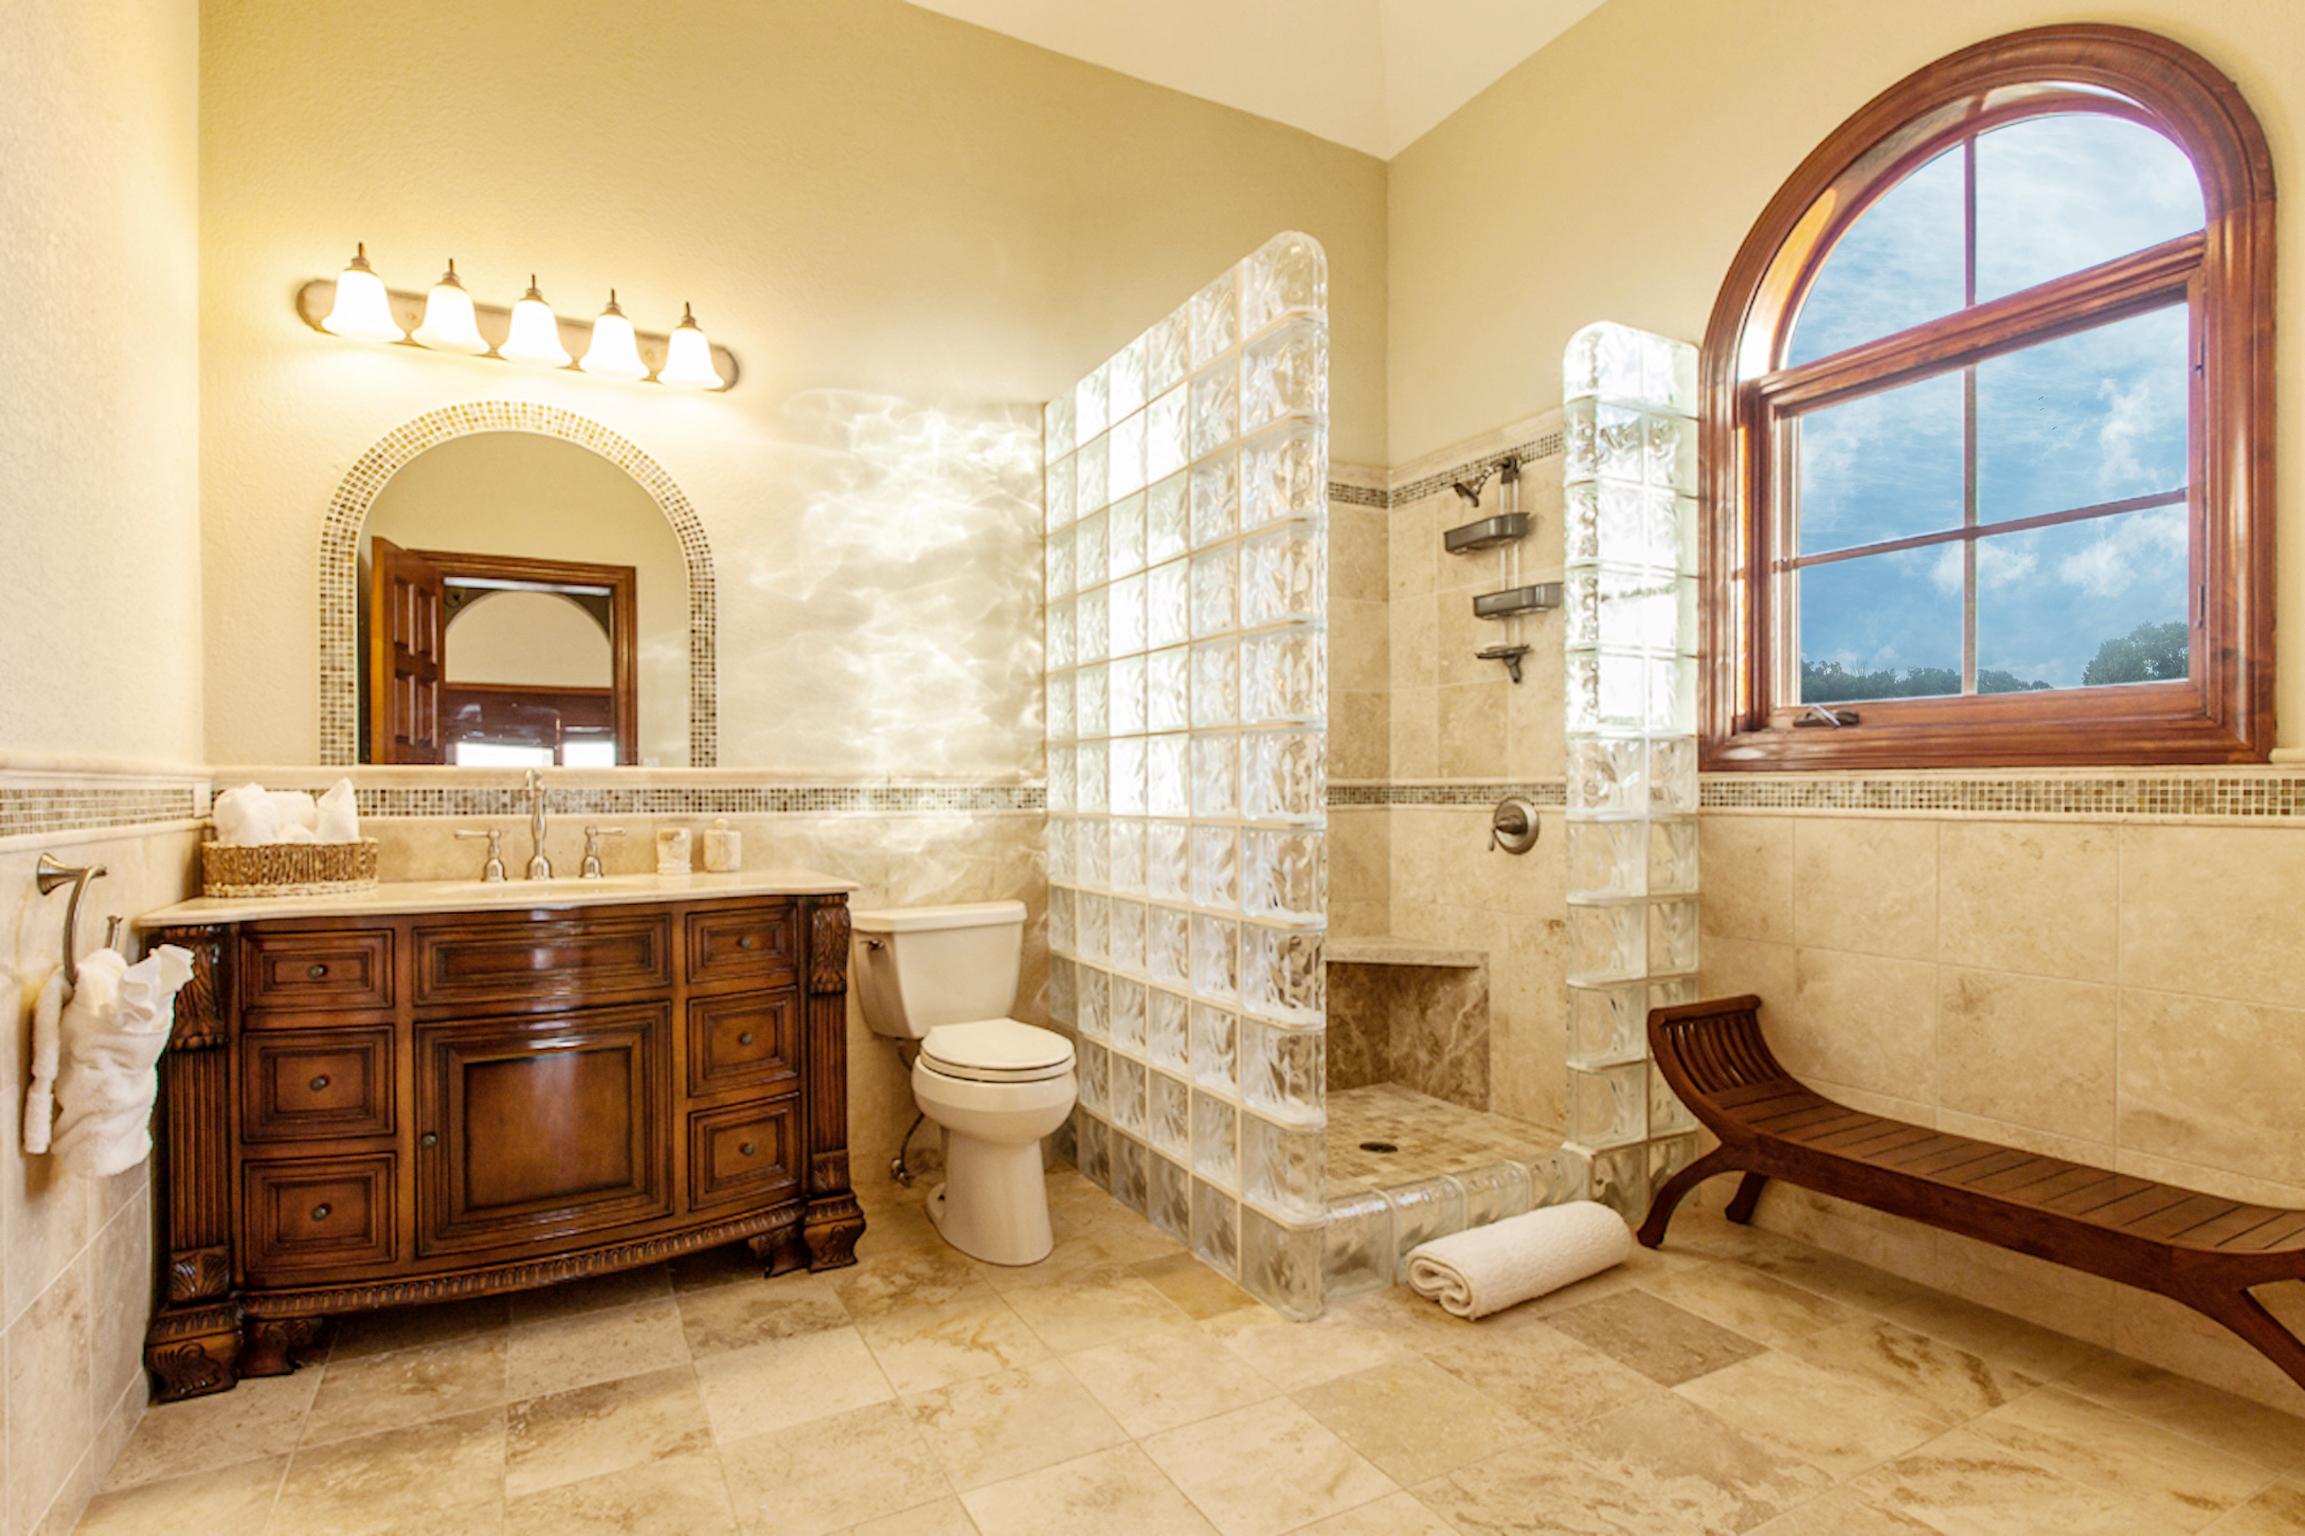 Bath jr master bahroom_edited